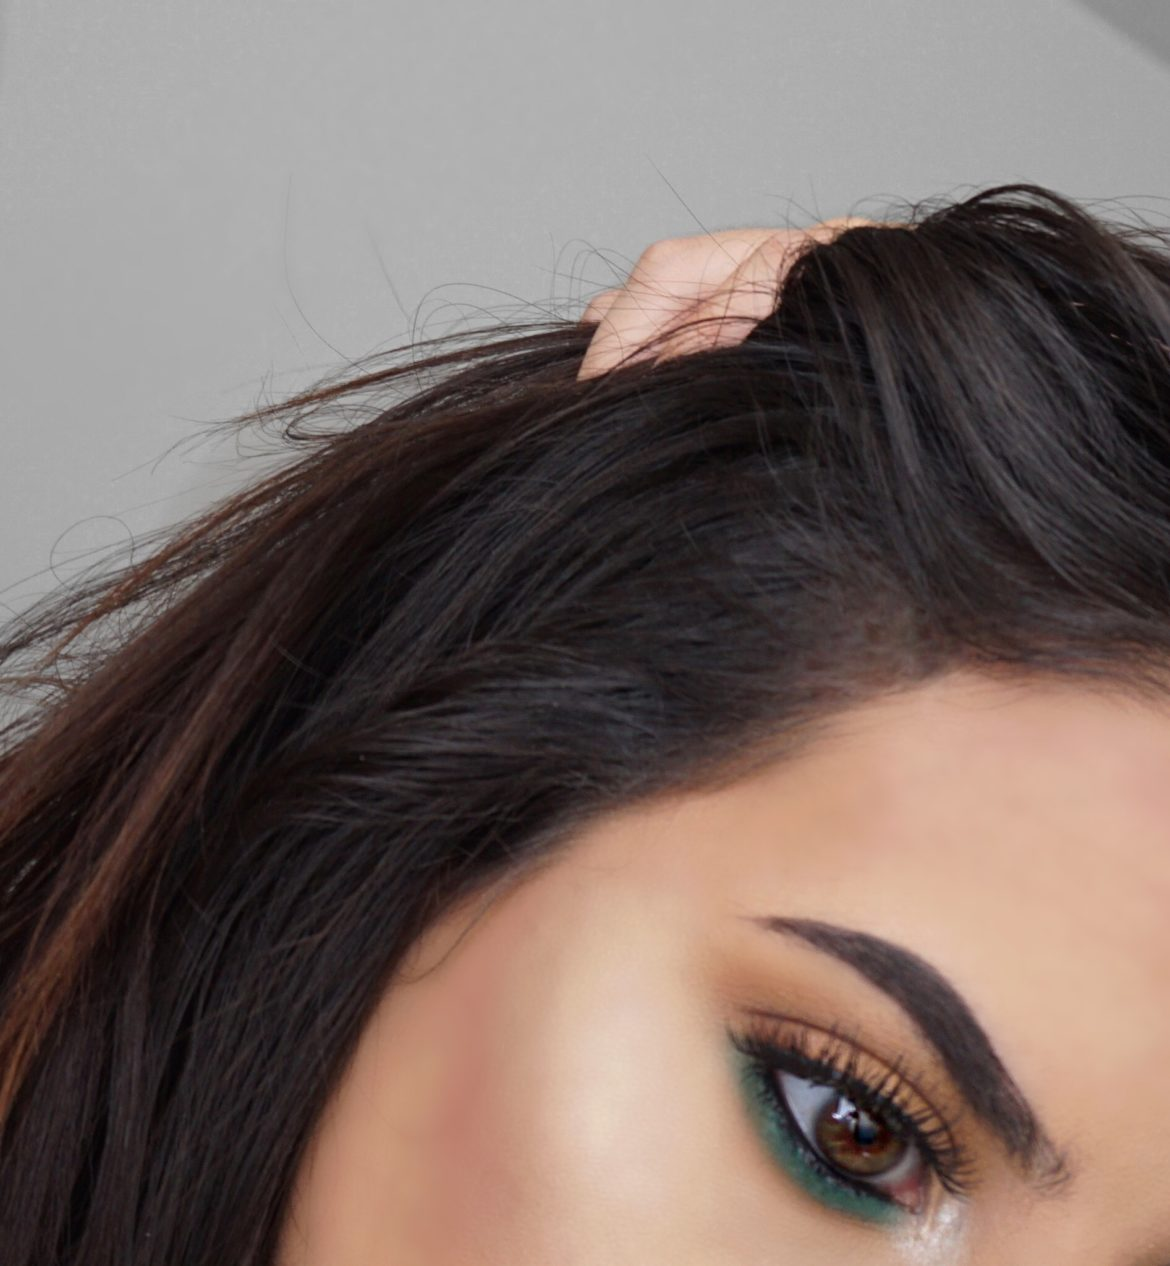 Orange W/ Pop Of Green Eyeshadow Makeup